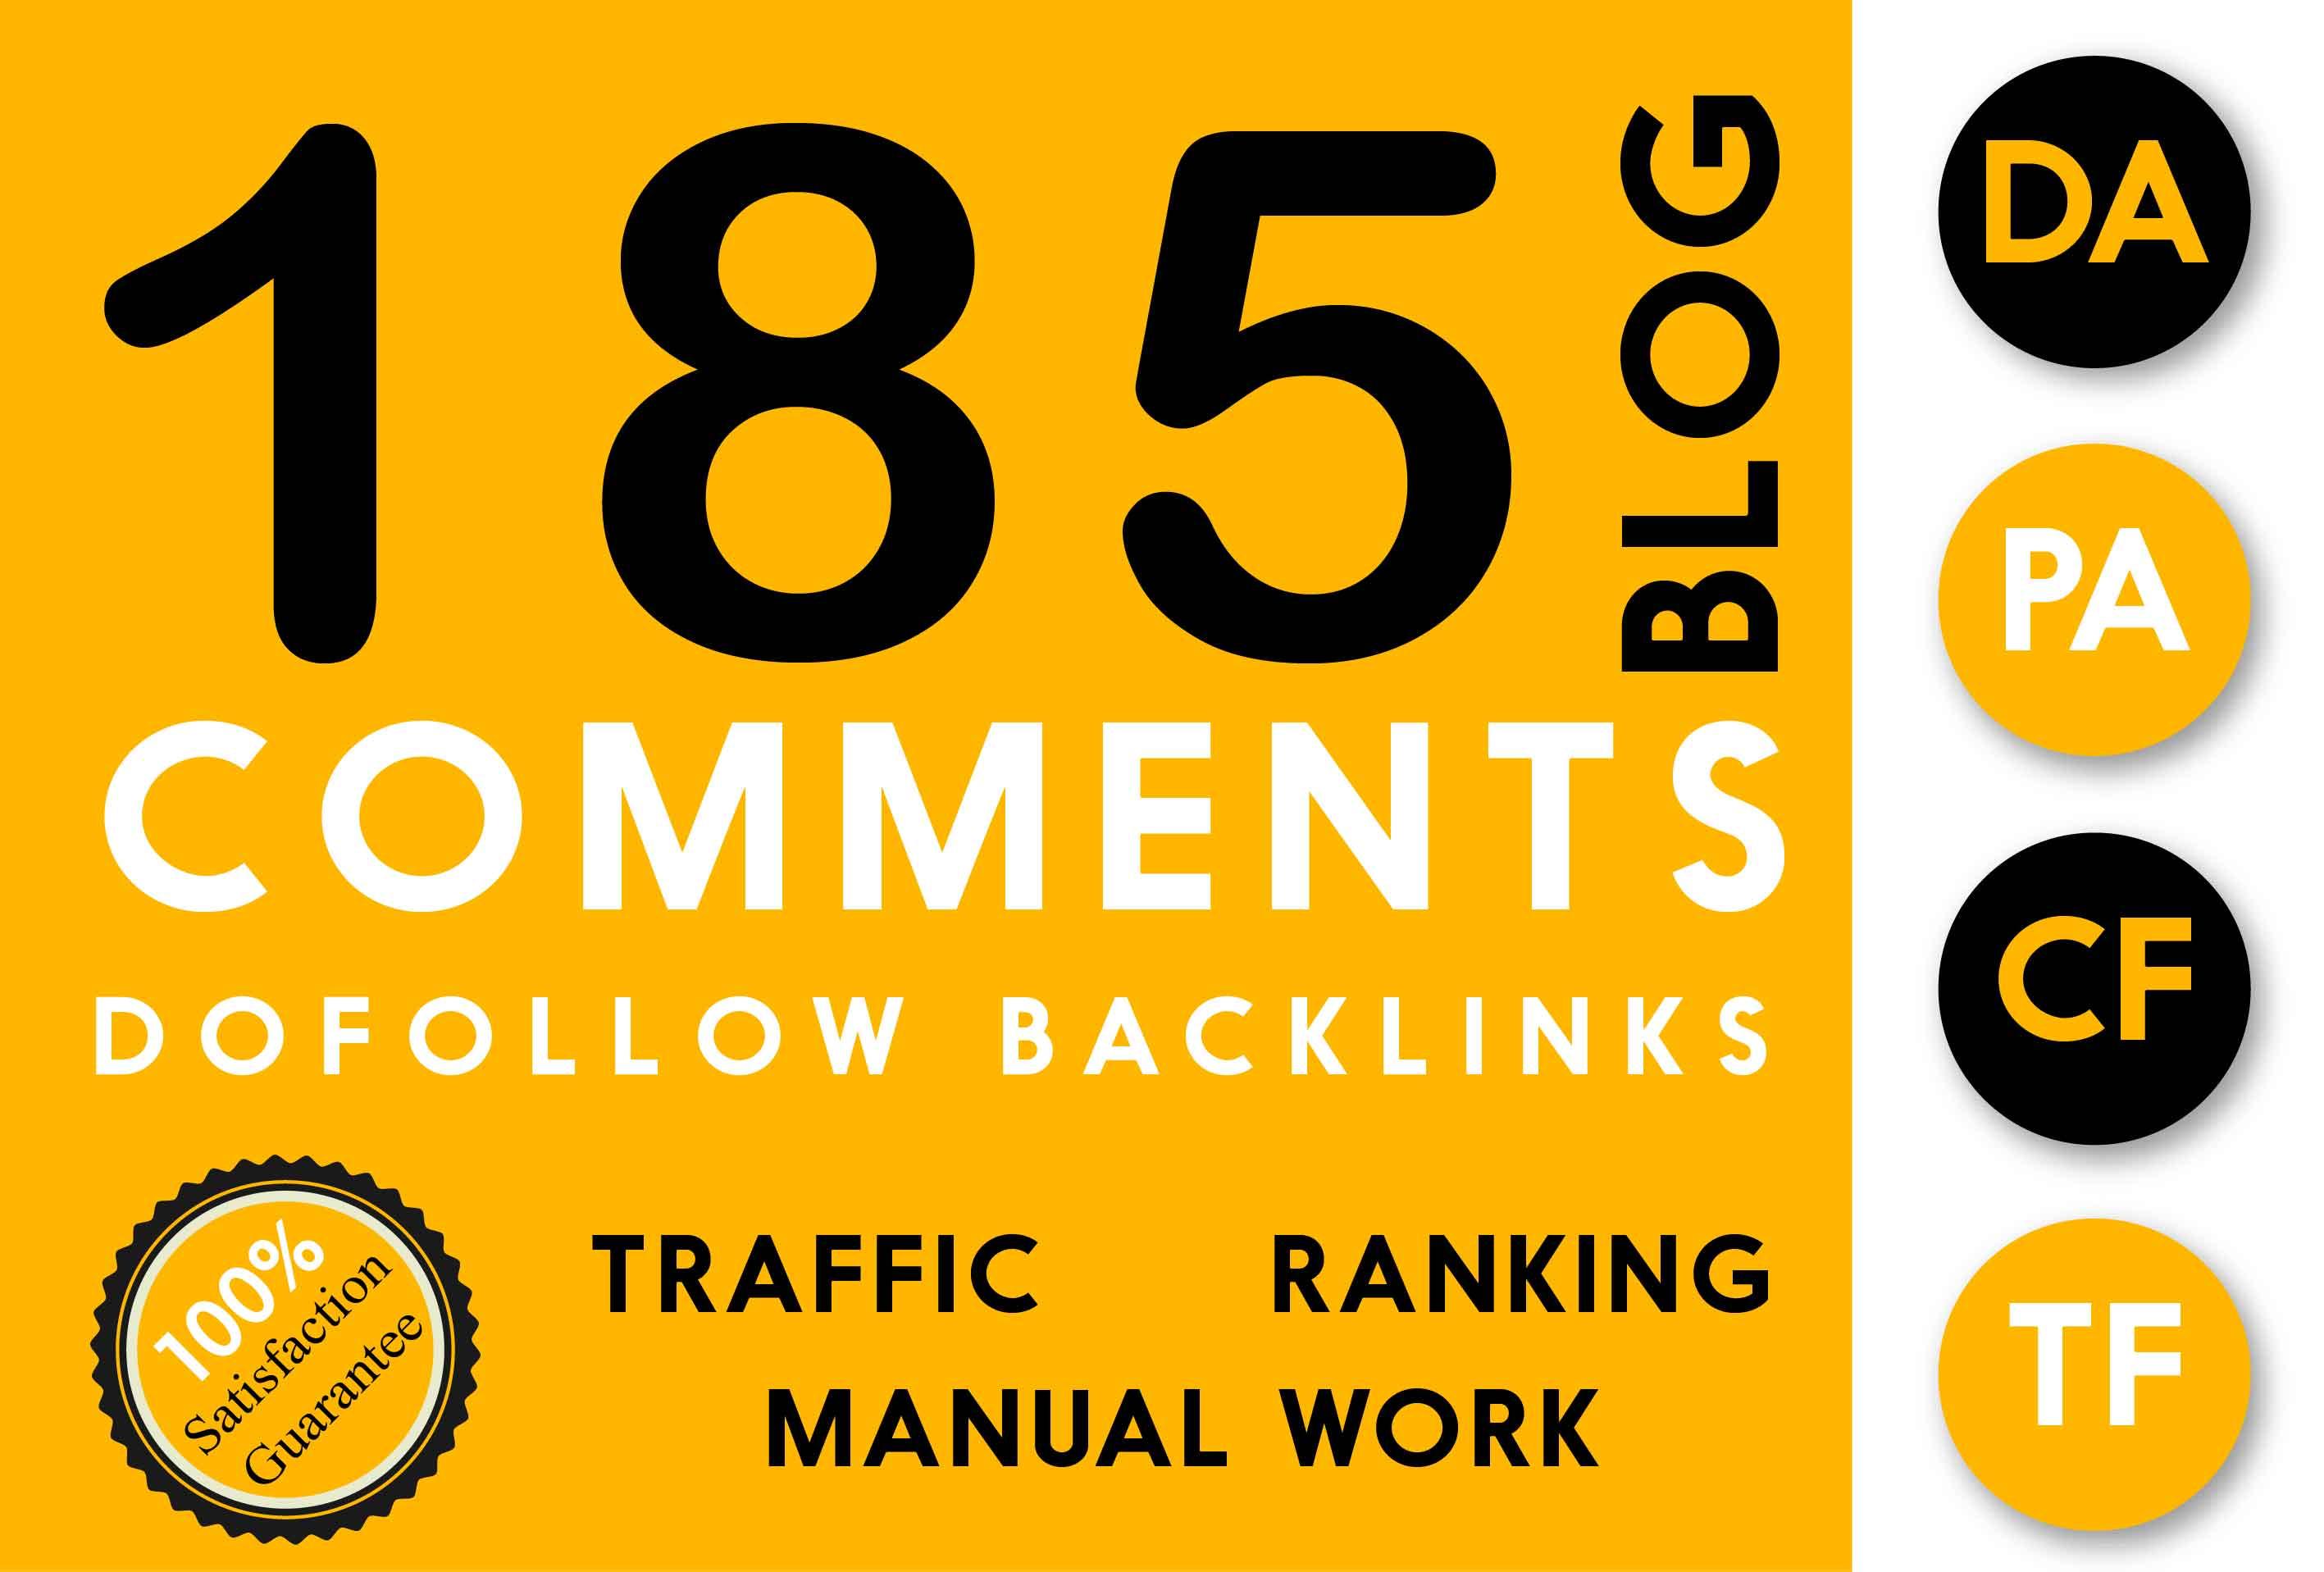 185 Blog Commenting Dofollow Backlinks High DA PA google Rank Website Traffic Obl Low